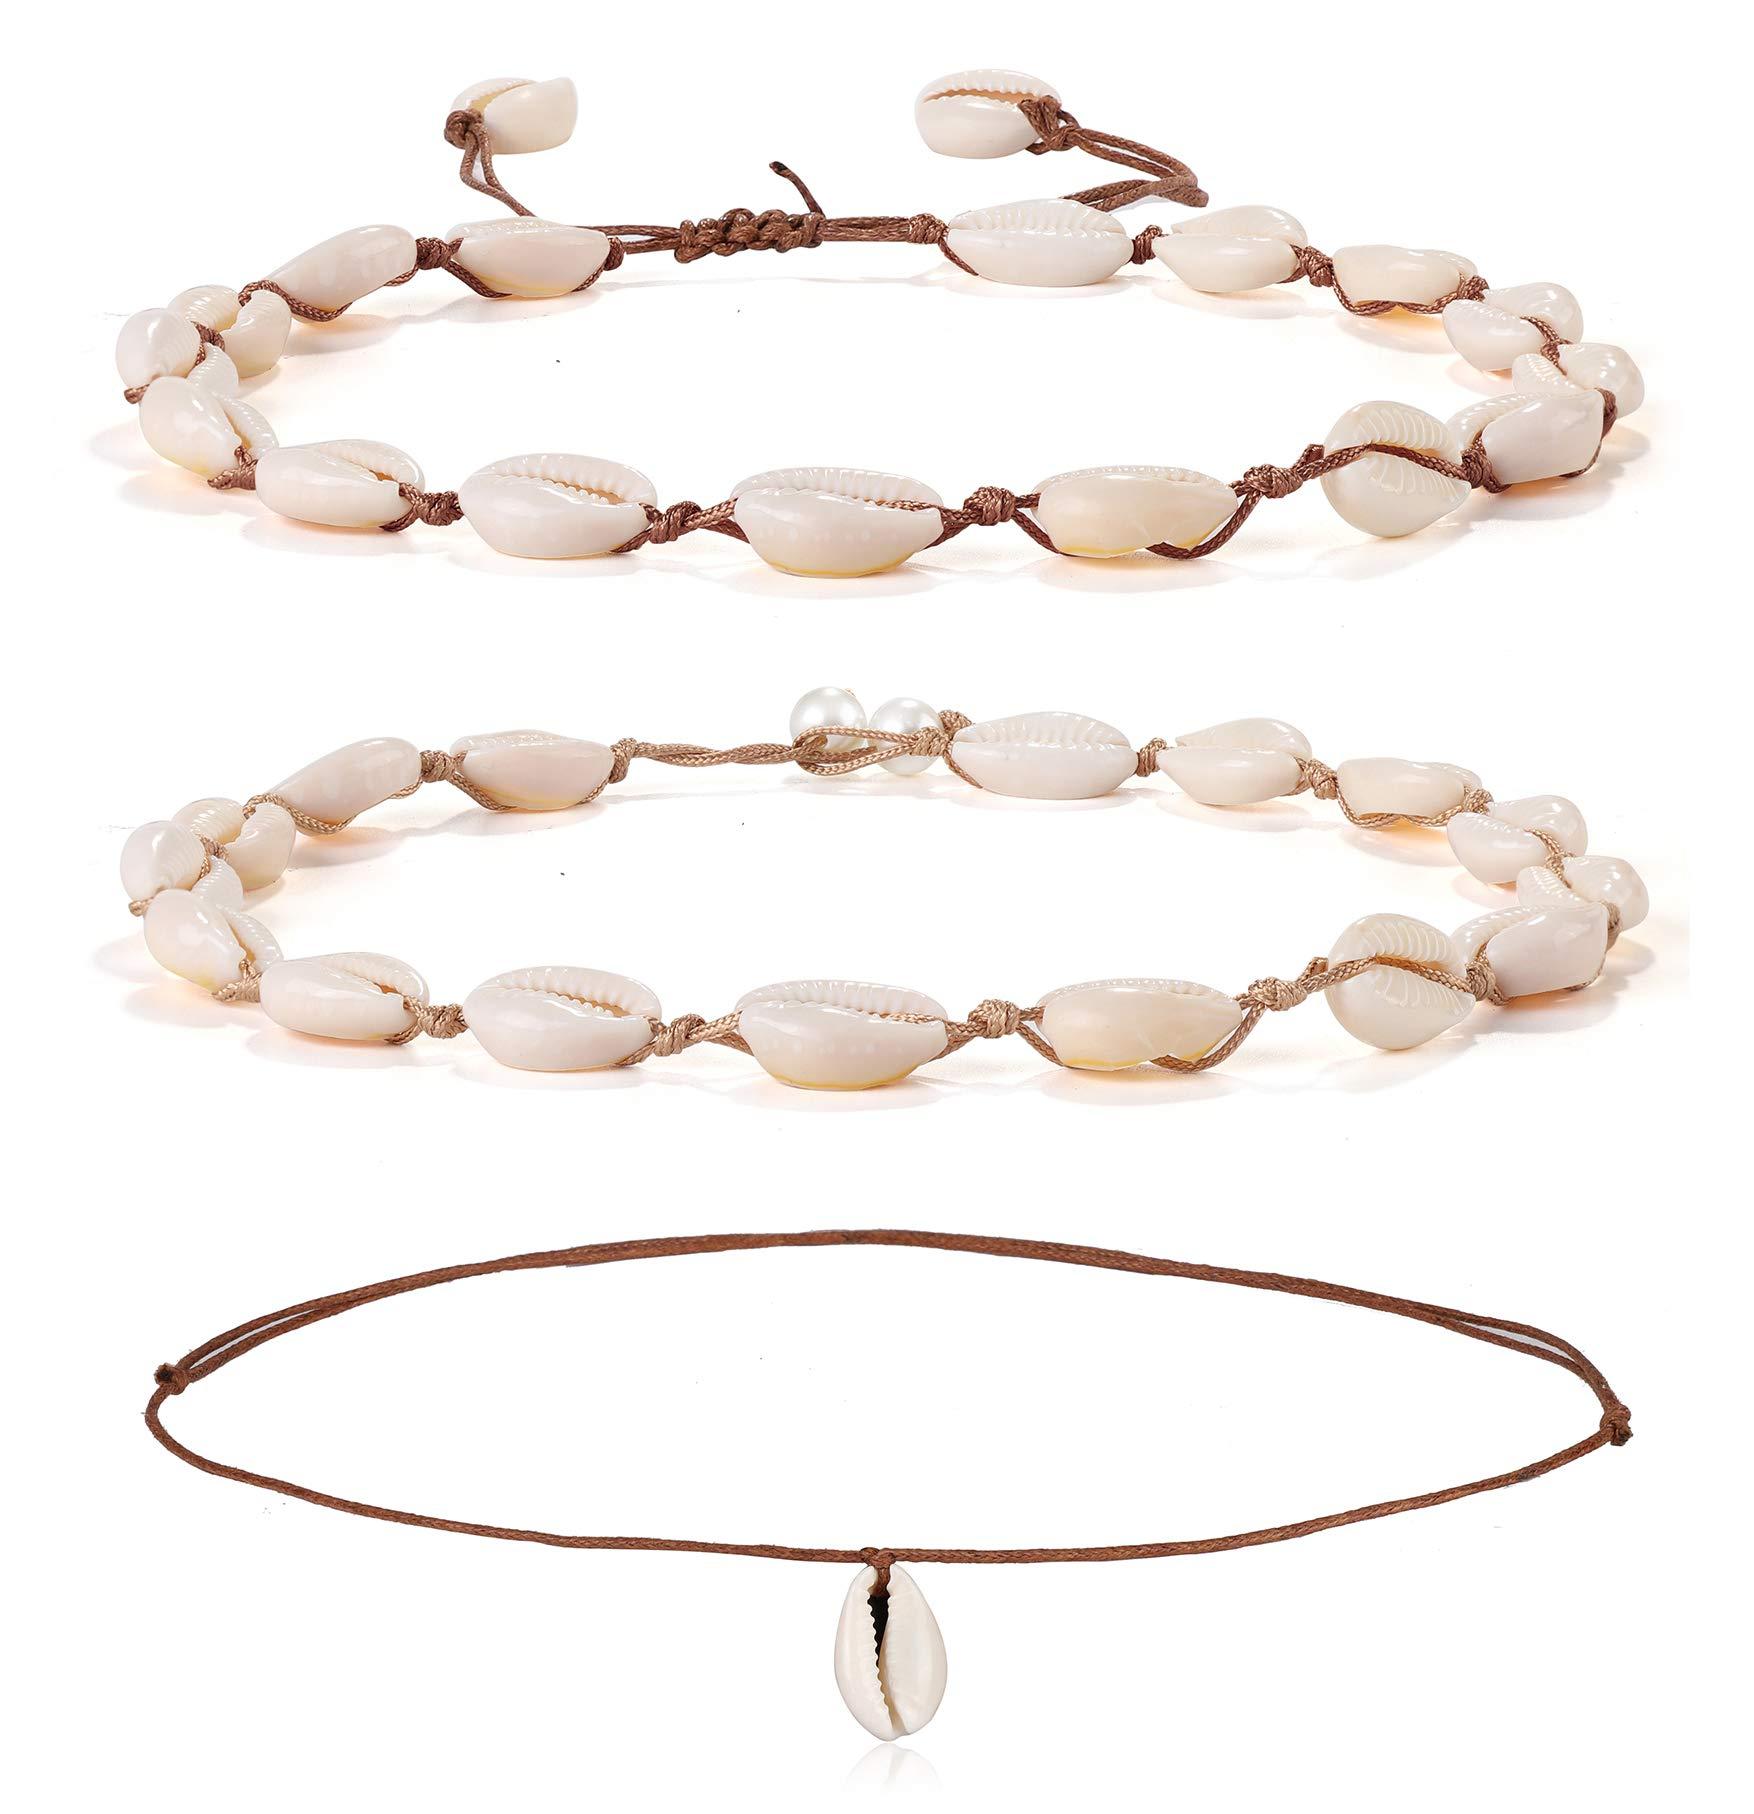 JOERICA 3 Pcs Natural Shell Choker Necklace for Women Girls Hawaii Wakiki Handmade Beach Bead Cowrie Seashell Choker Adjustable